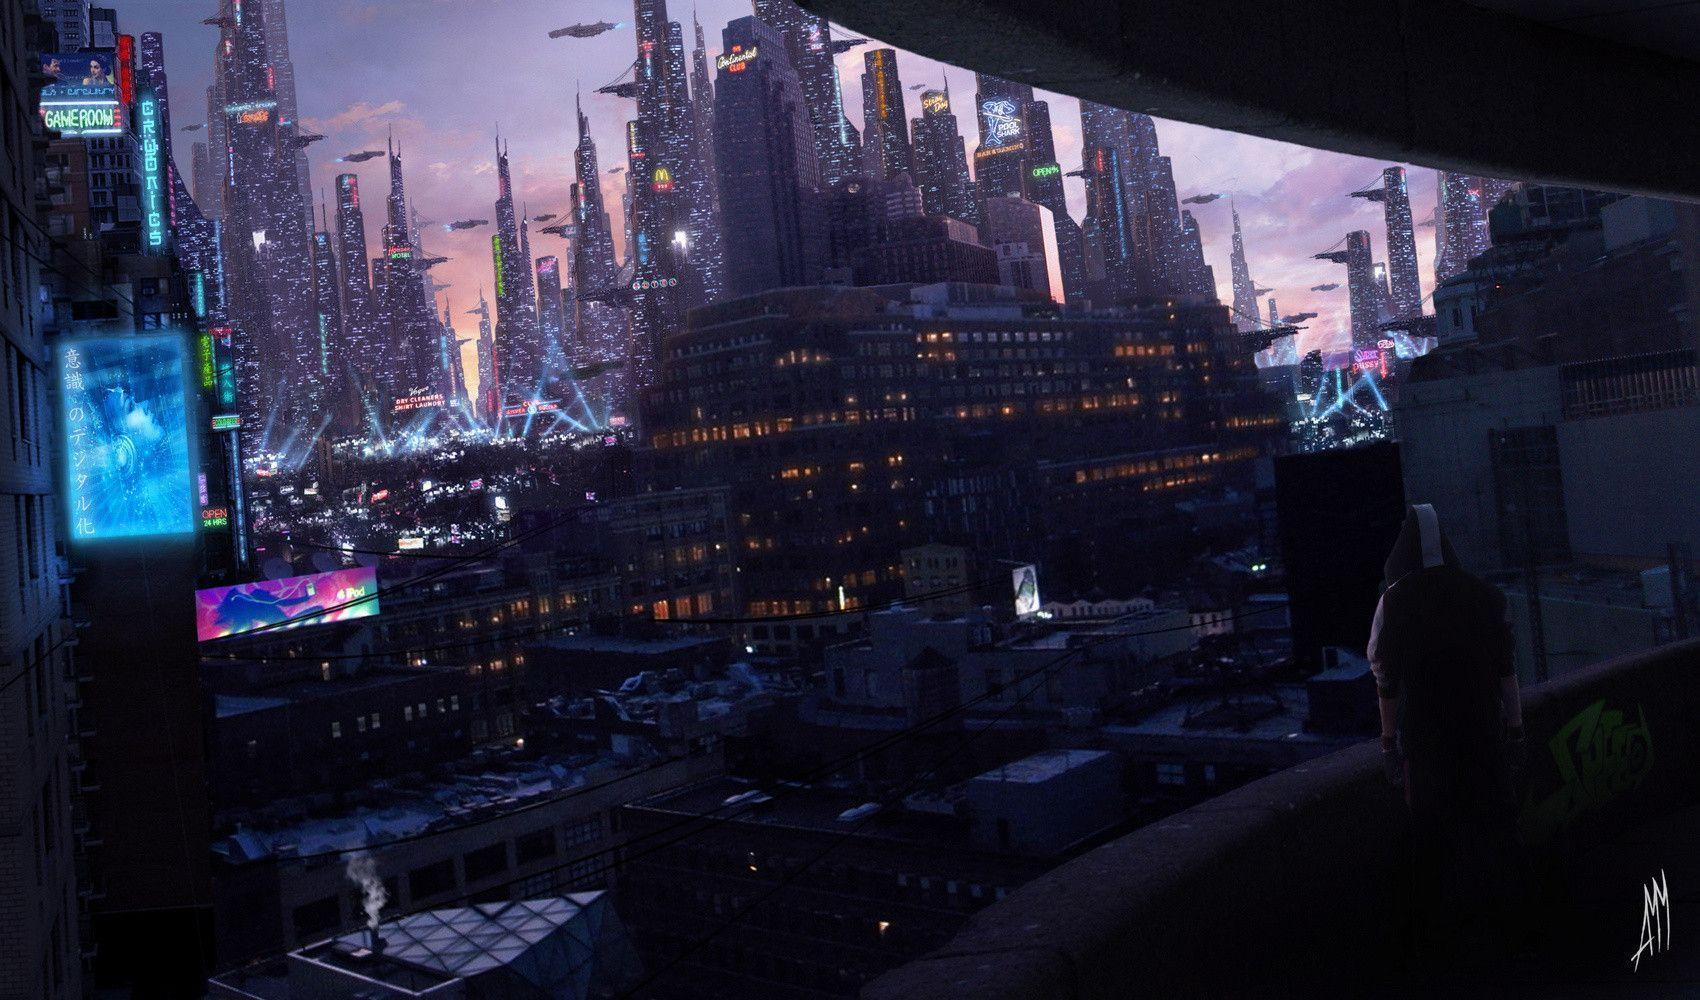 cyberpunk city hd wallpapers - photo #13